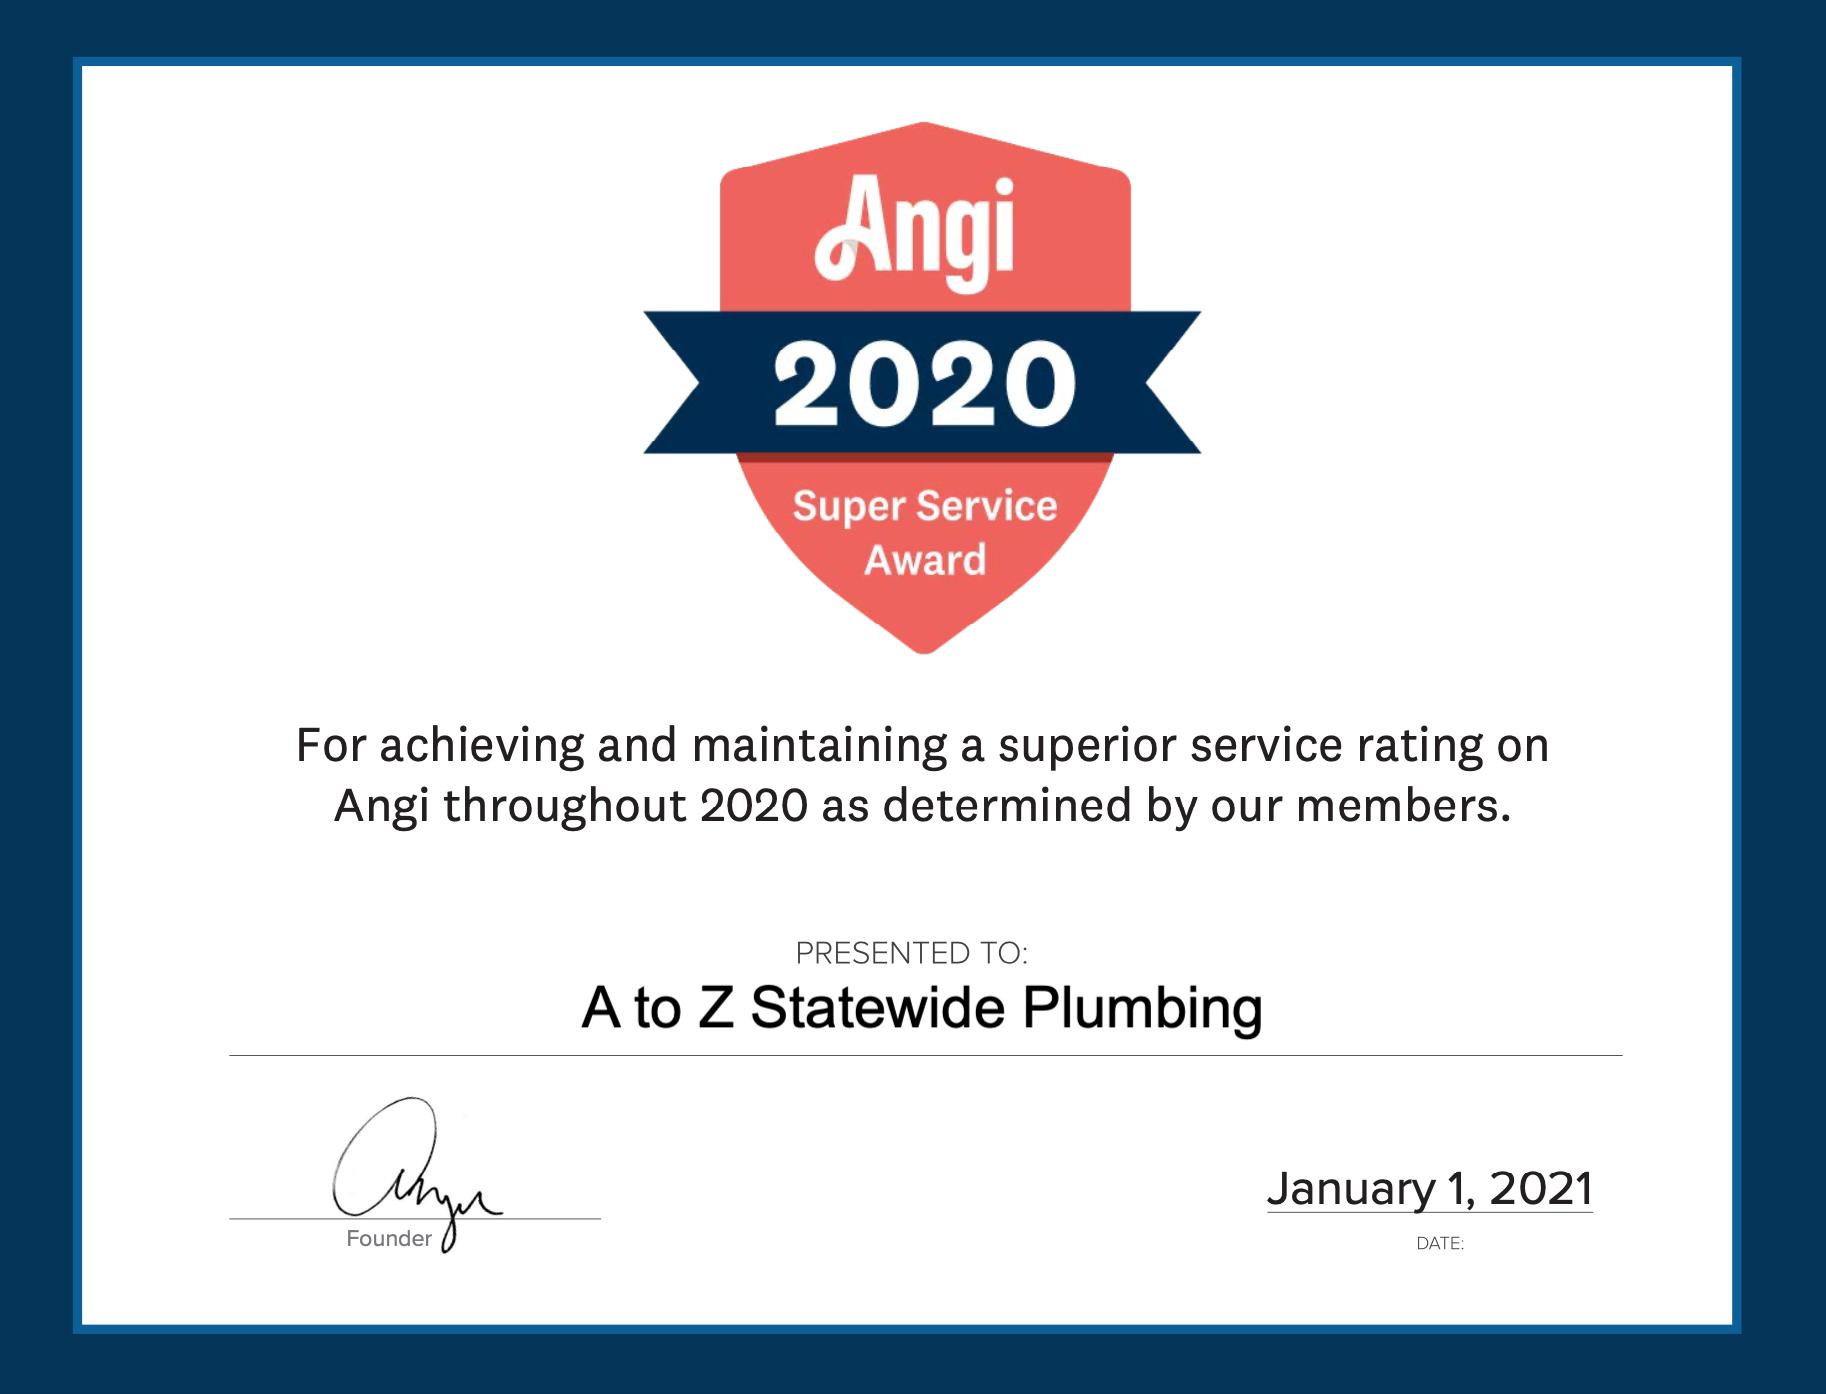 Angi Super Service Award 2020